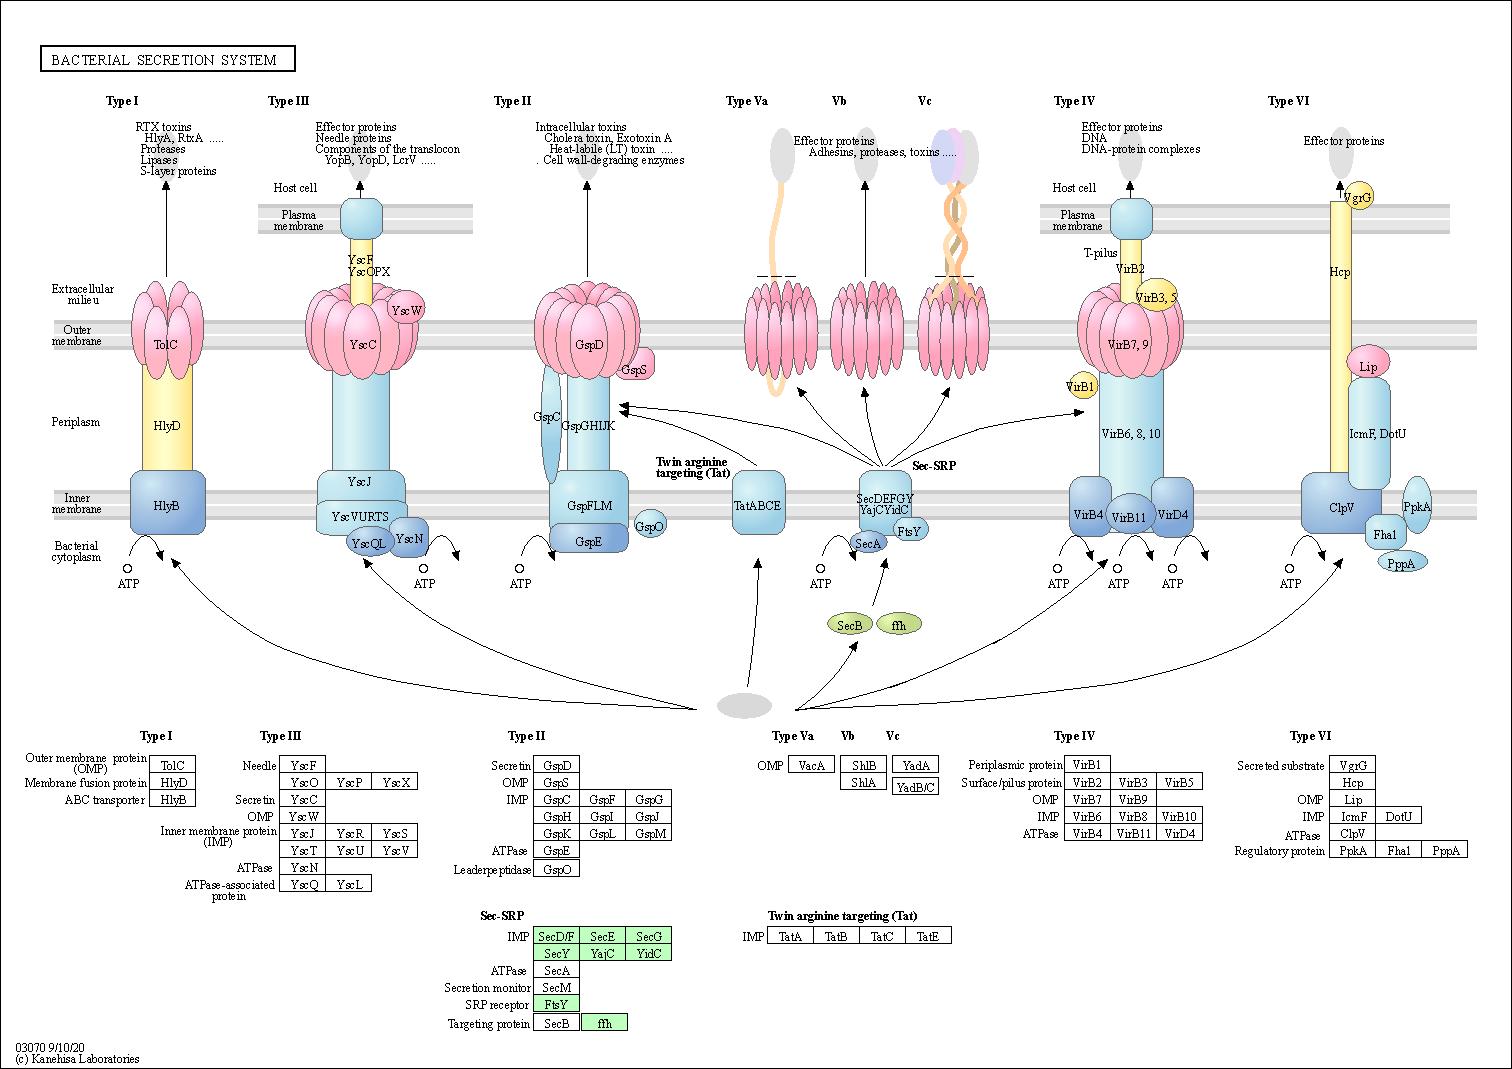 hight resolution of graphical representation of bacterial secretion system baumannia cicadellinicola hc symbioint of homalodisca coagulata glassy winged sharpshooter